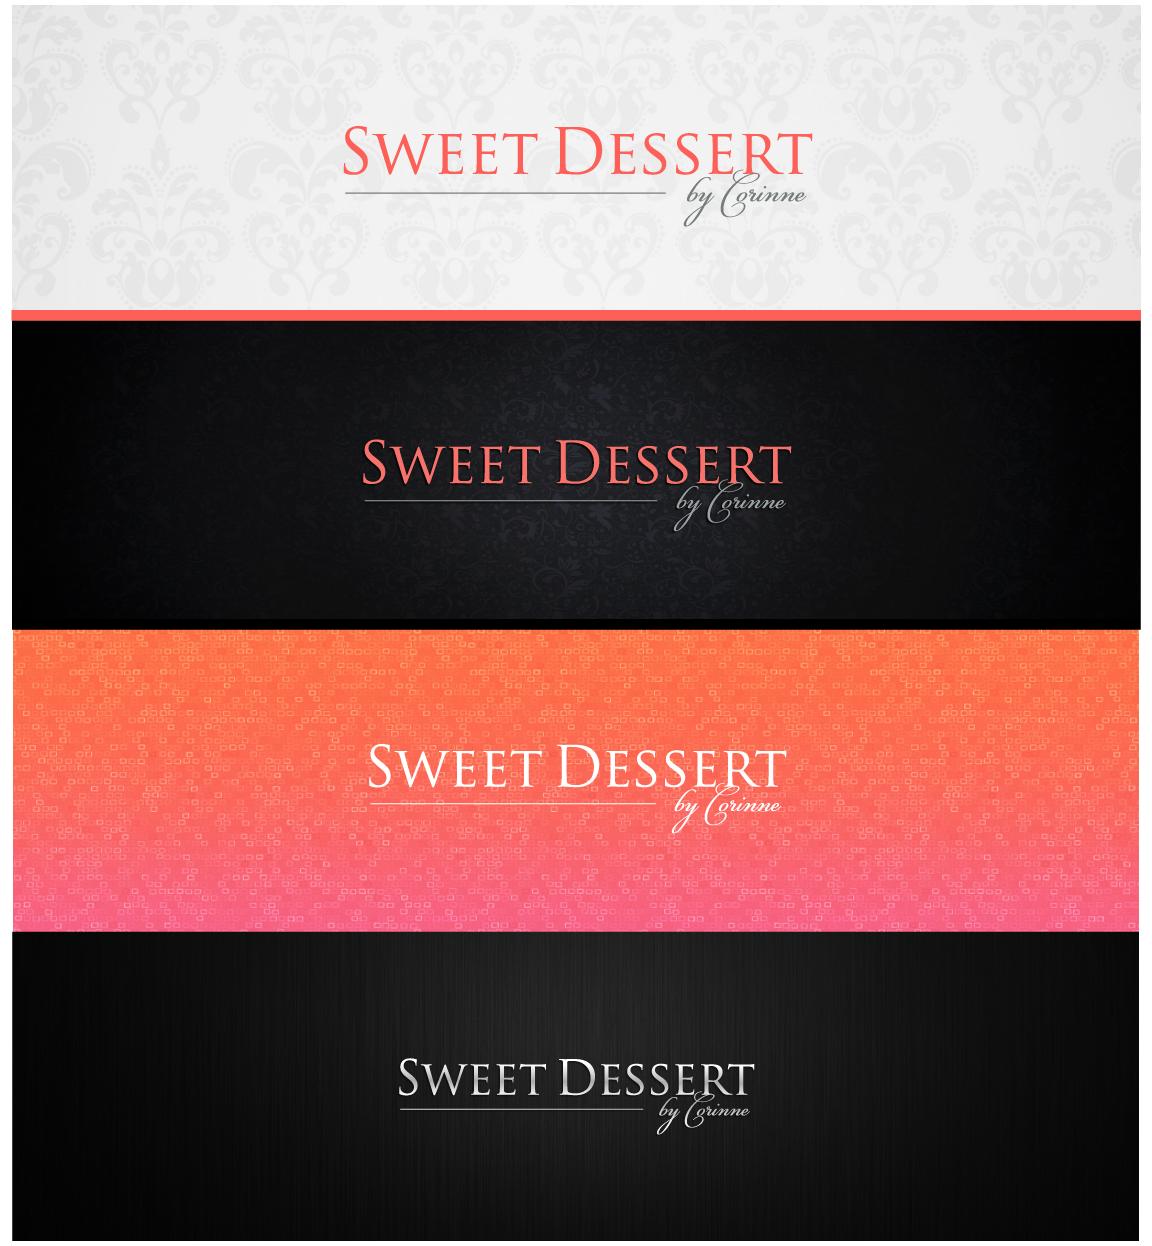 Create a logo for Skin Care business Sweet Dessert